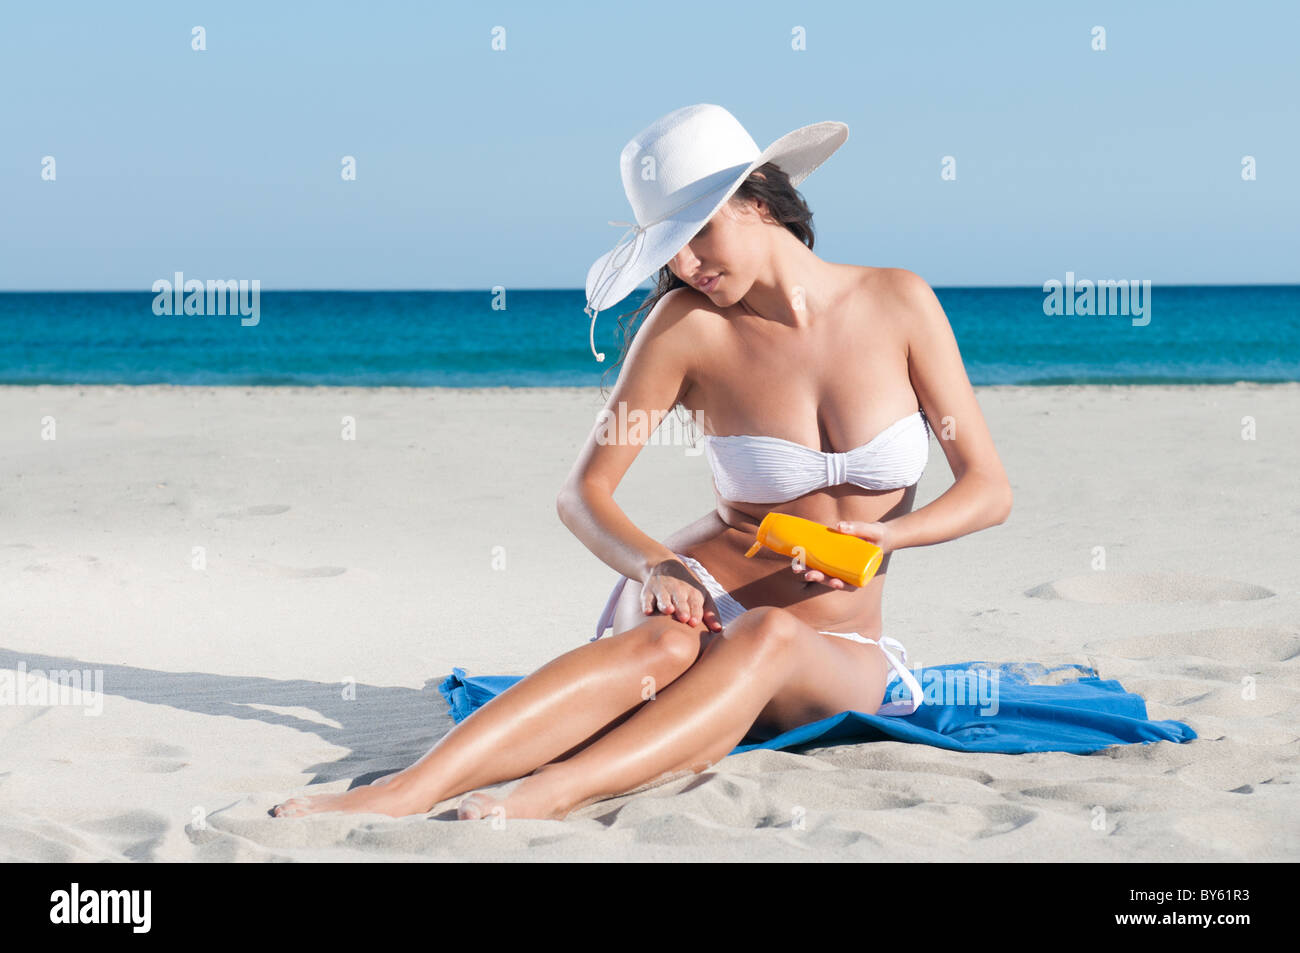 Beautiful young woman applying sun protective lotion before sunbath - Stock Image